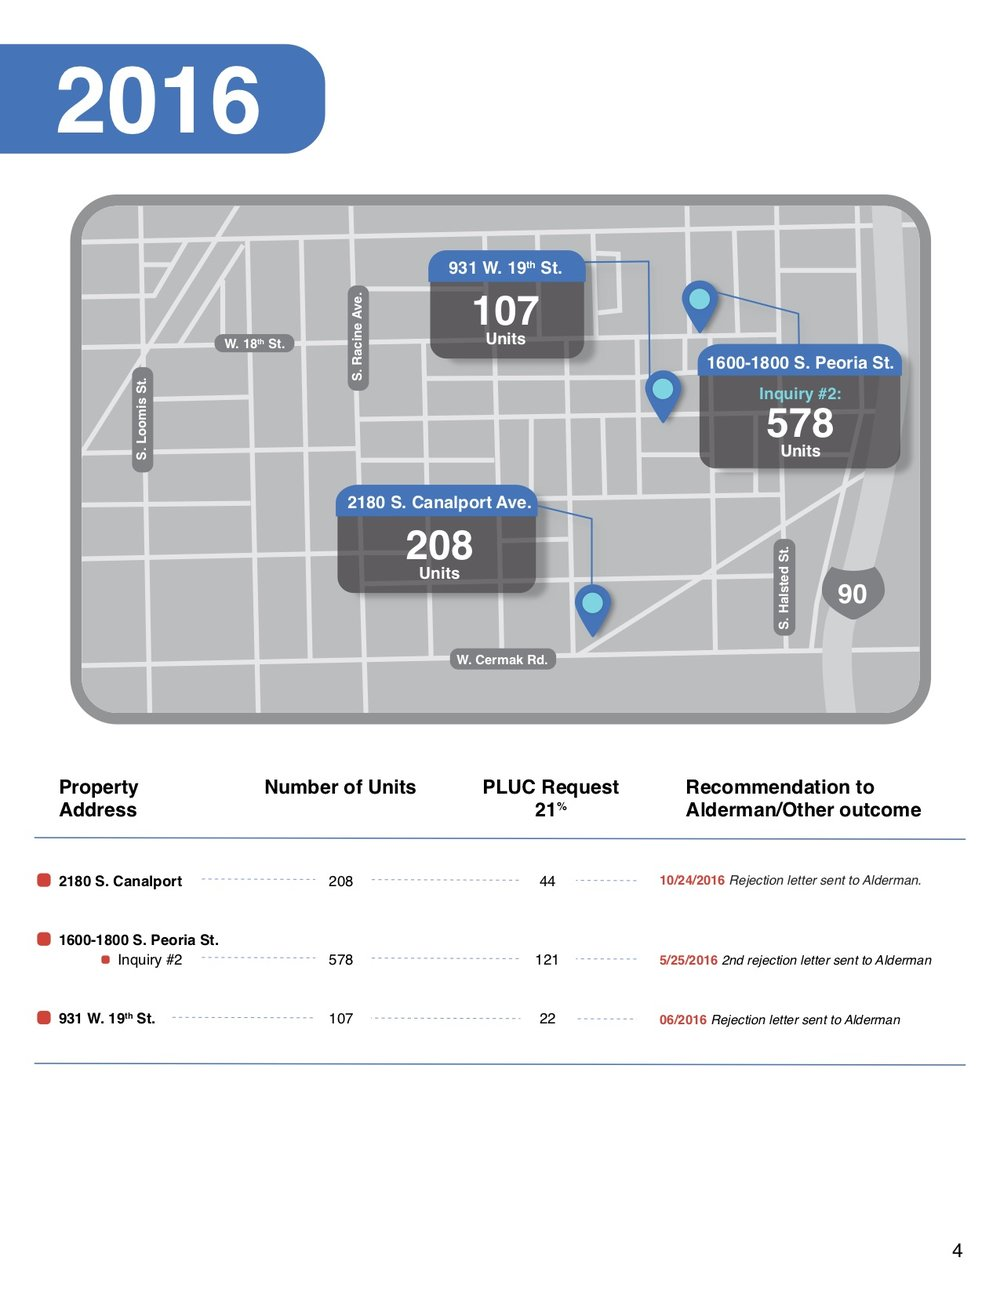 PLUC-Activity-Report.Final_4.jpg